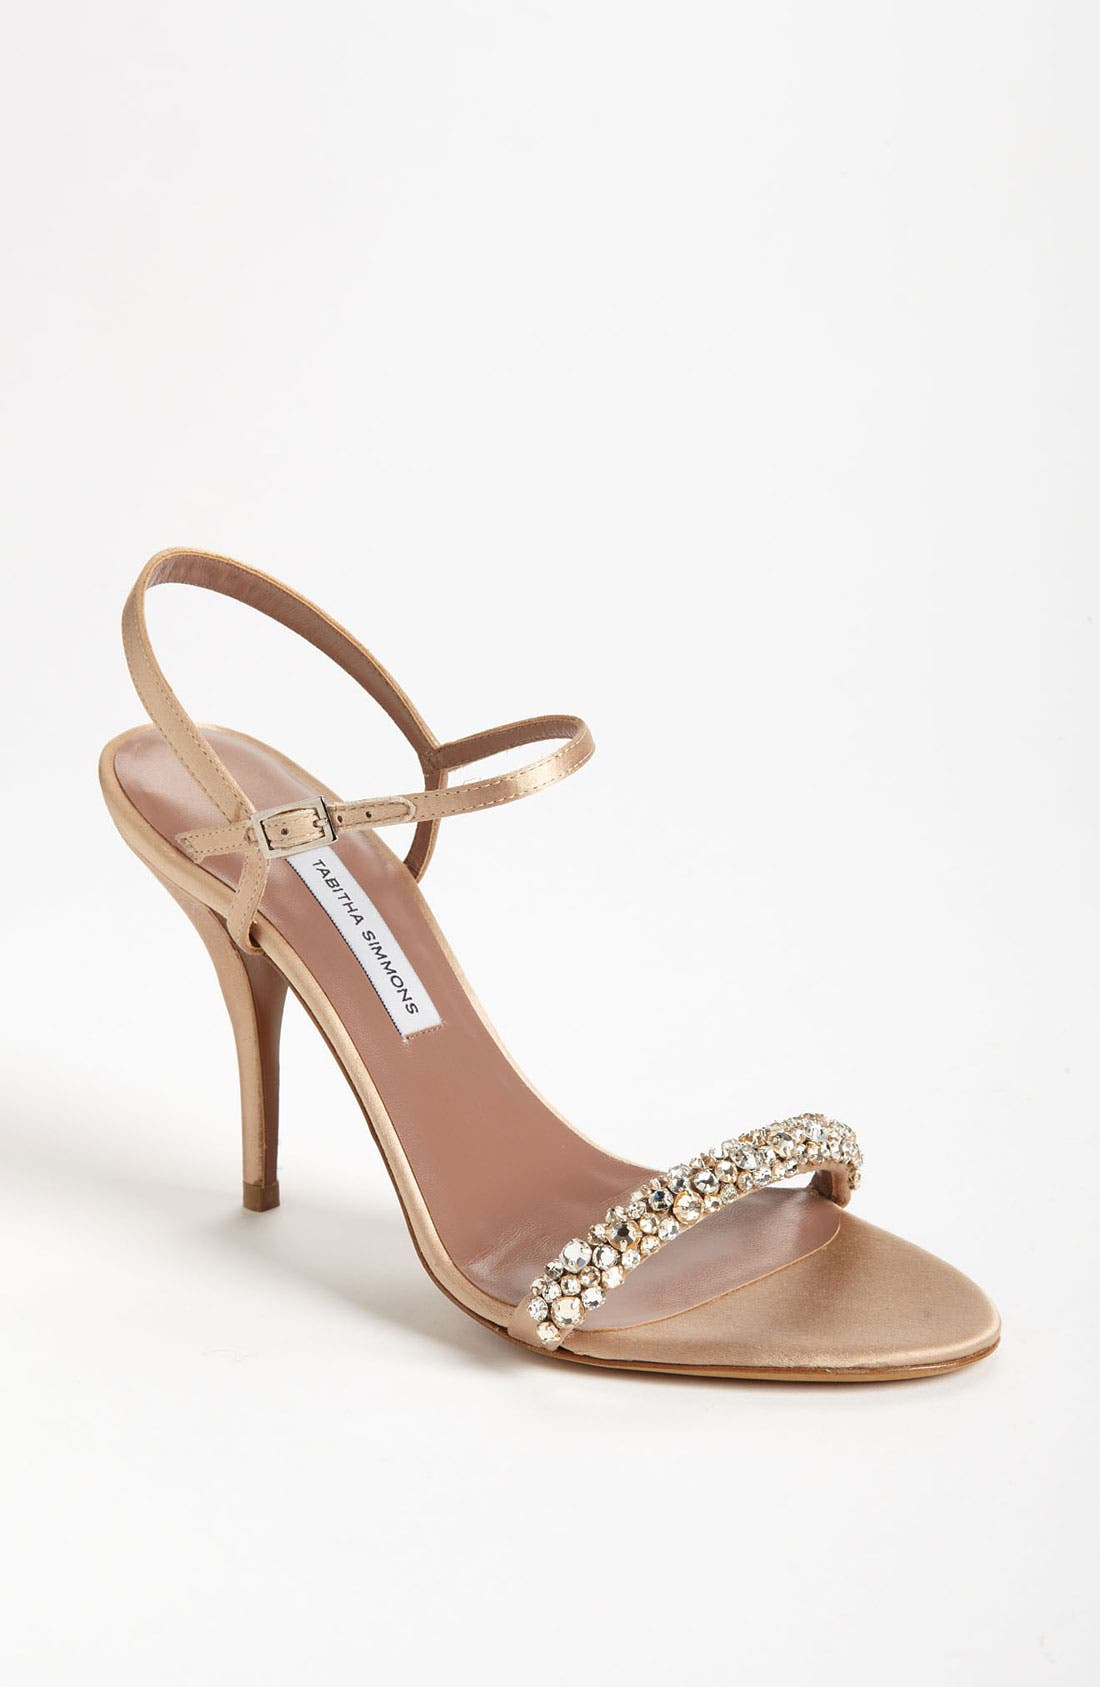 Alternate Image 1 Selected - Tabitha Simmons 'Deon' Sandal